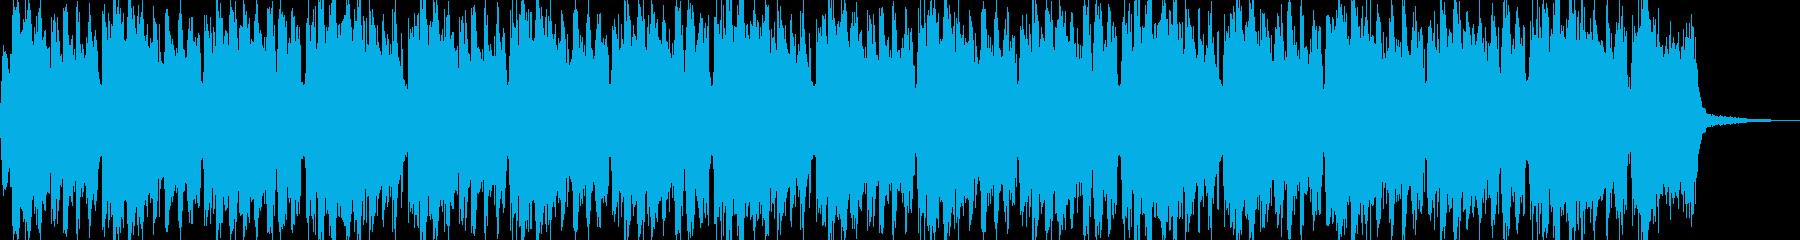 RPGゲーム 城・王宮イメージサウンドの再生済みの波形